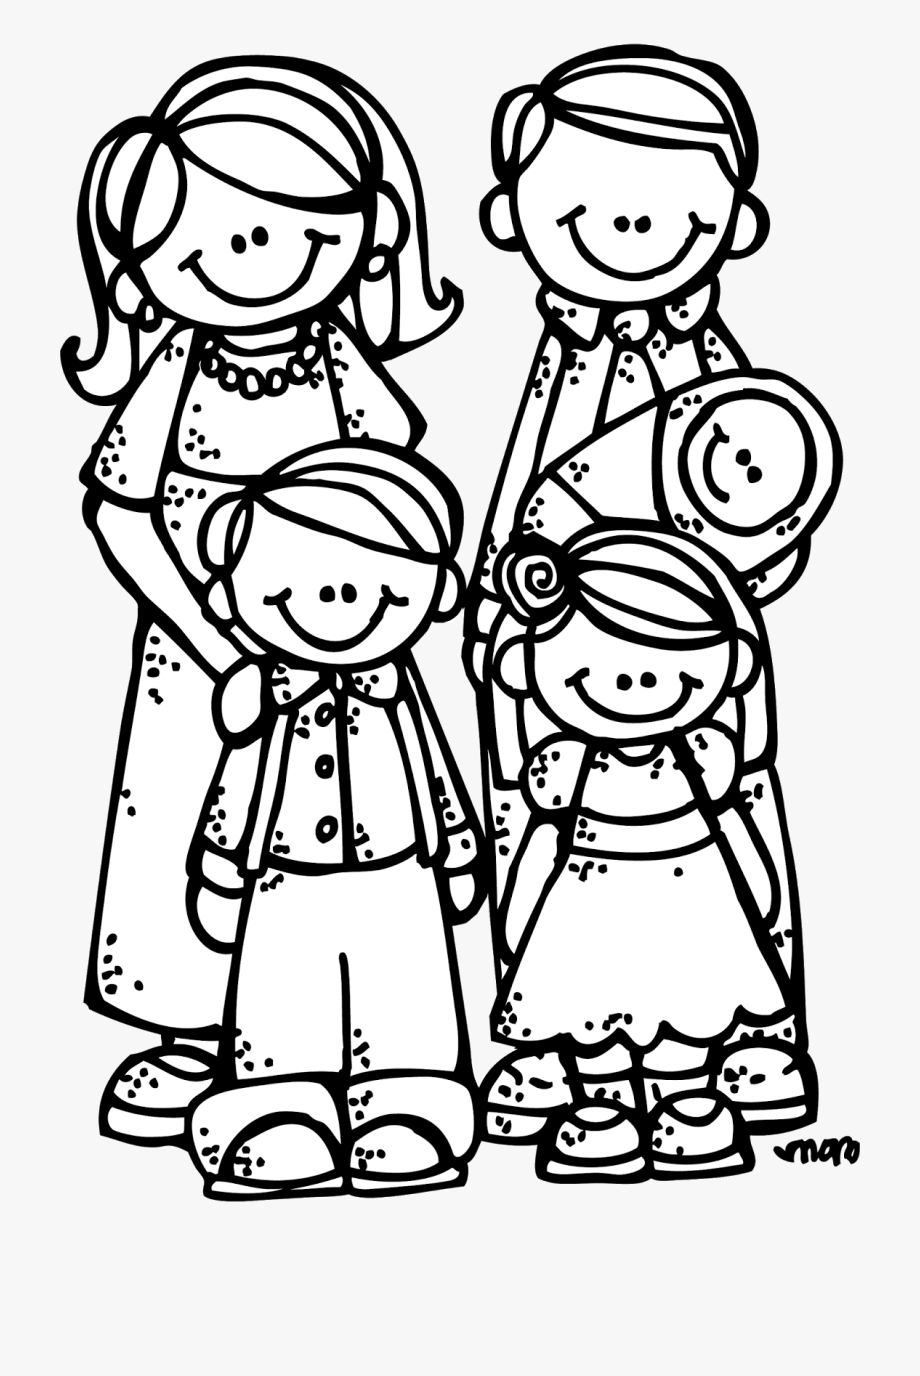 Family clipart white. Melonheadz lds illustrating black